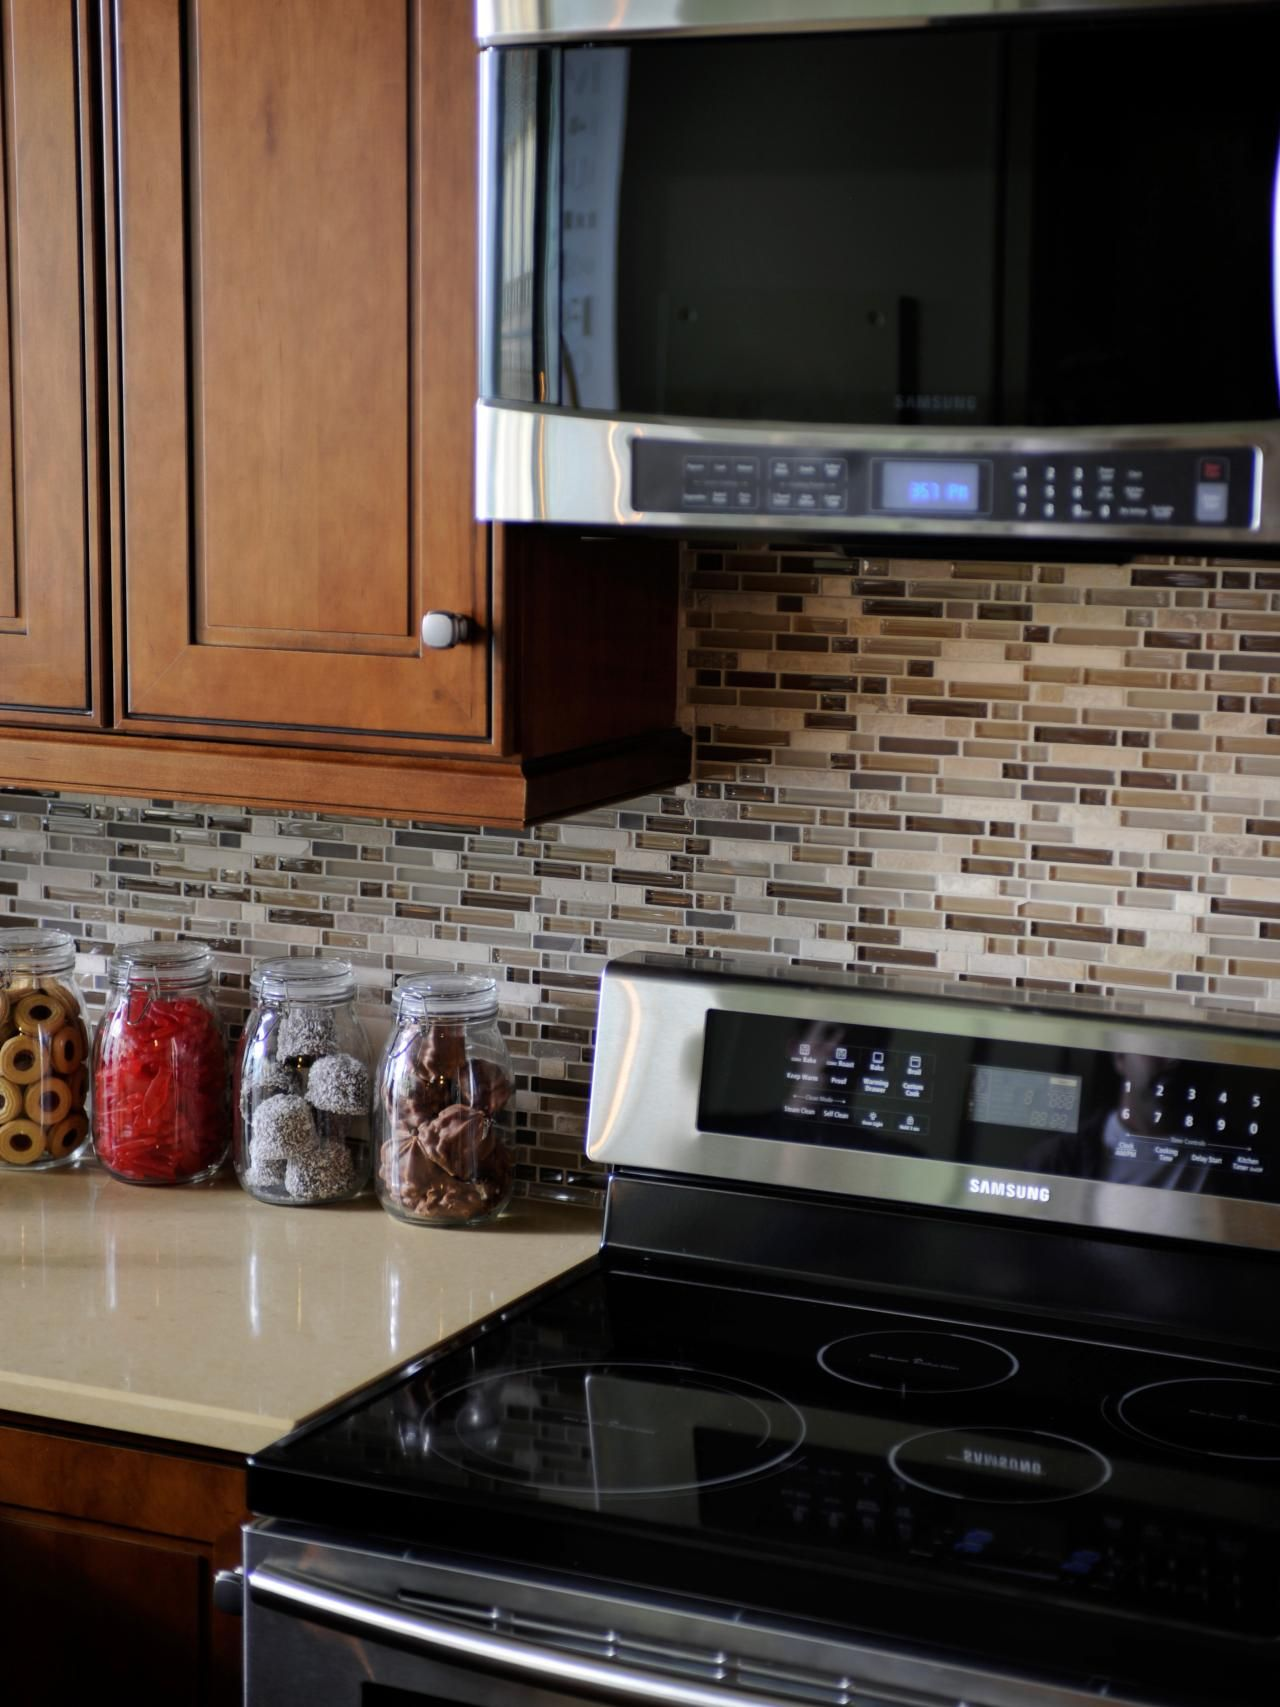 Pictures of kitchen backsplash ideas from hgtv kitchens